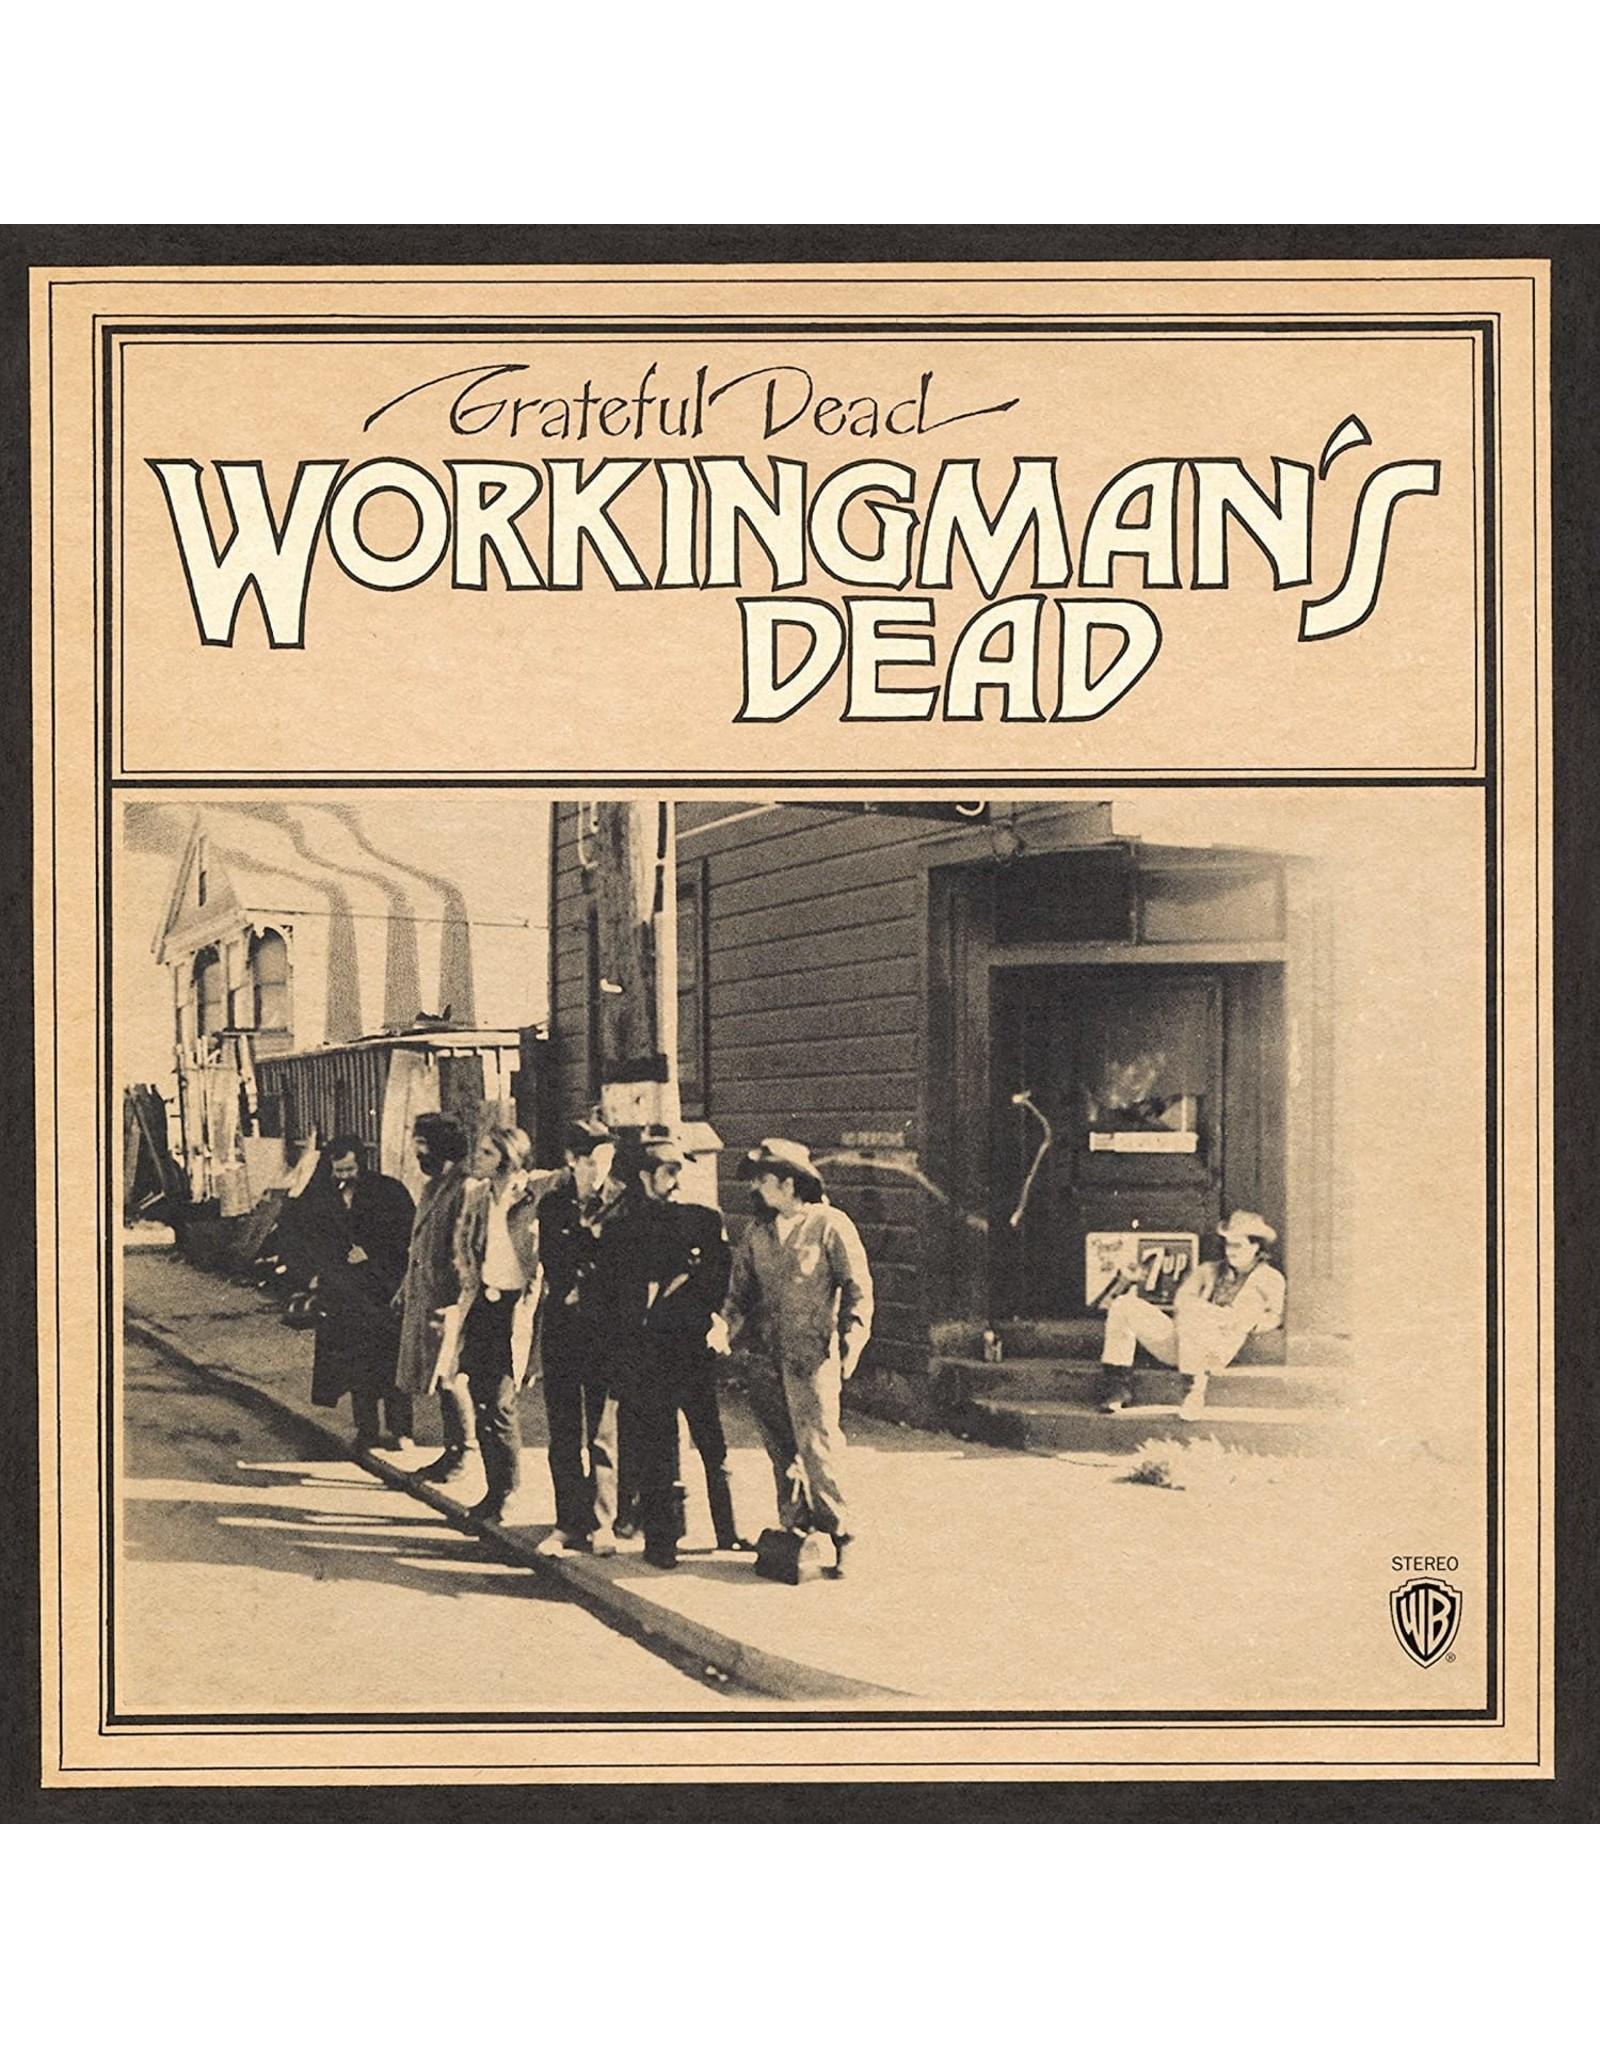 Grateful Dead - Workingman's Dead (50th Anniversary) LP